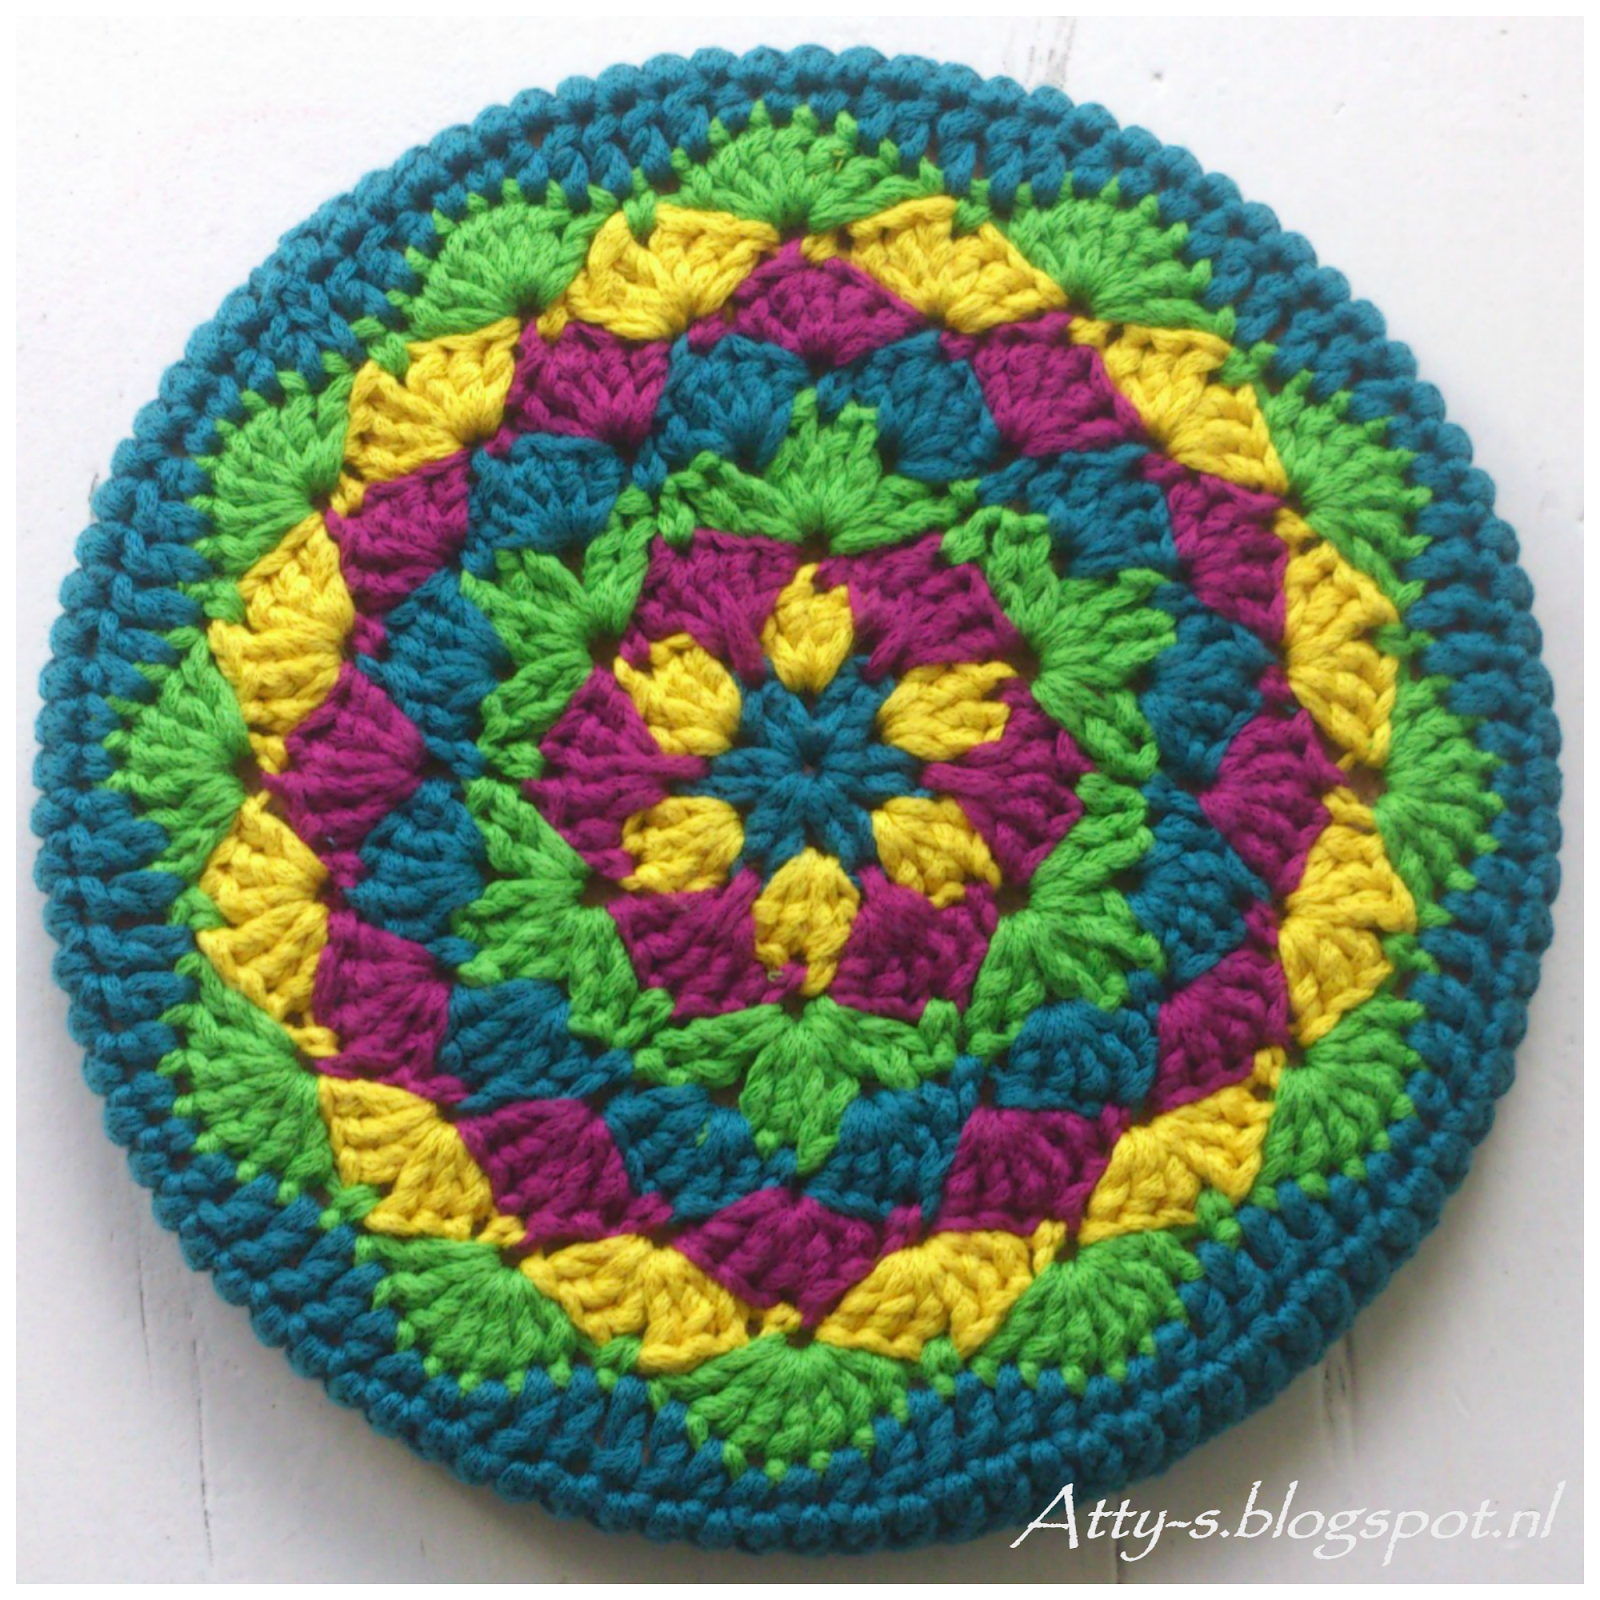 http://atty-s.blogspot.nl/2015/03/kaleidoscope-pot-coasters-tutorial ...